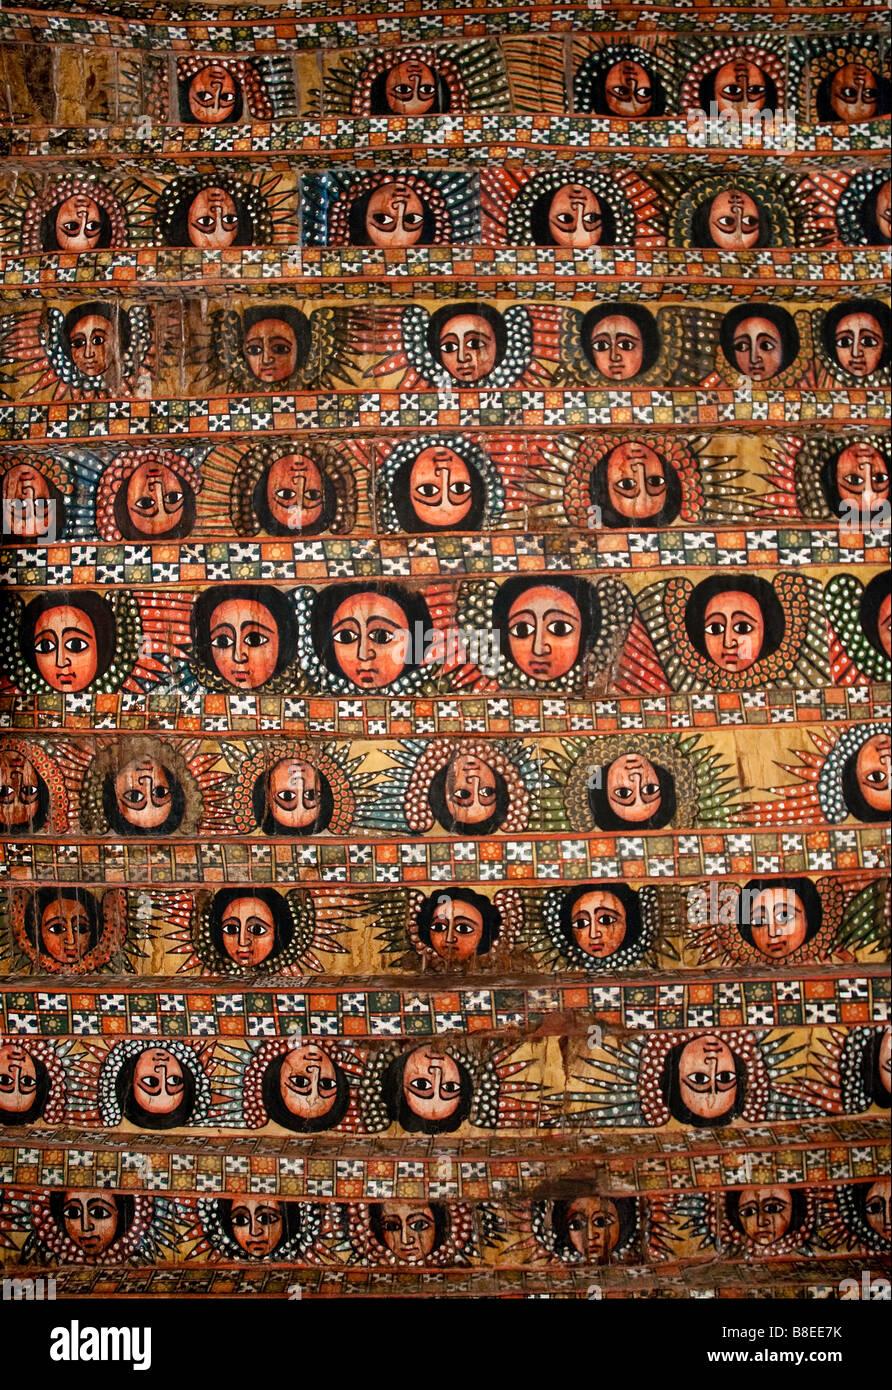 ethiopian christian coptic east african religion religious art